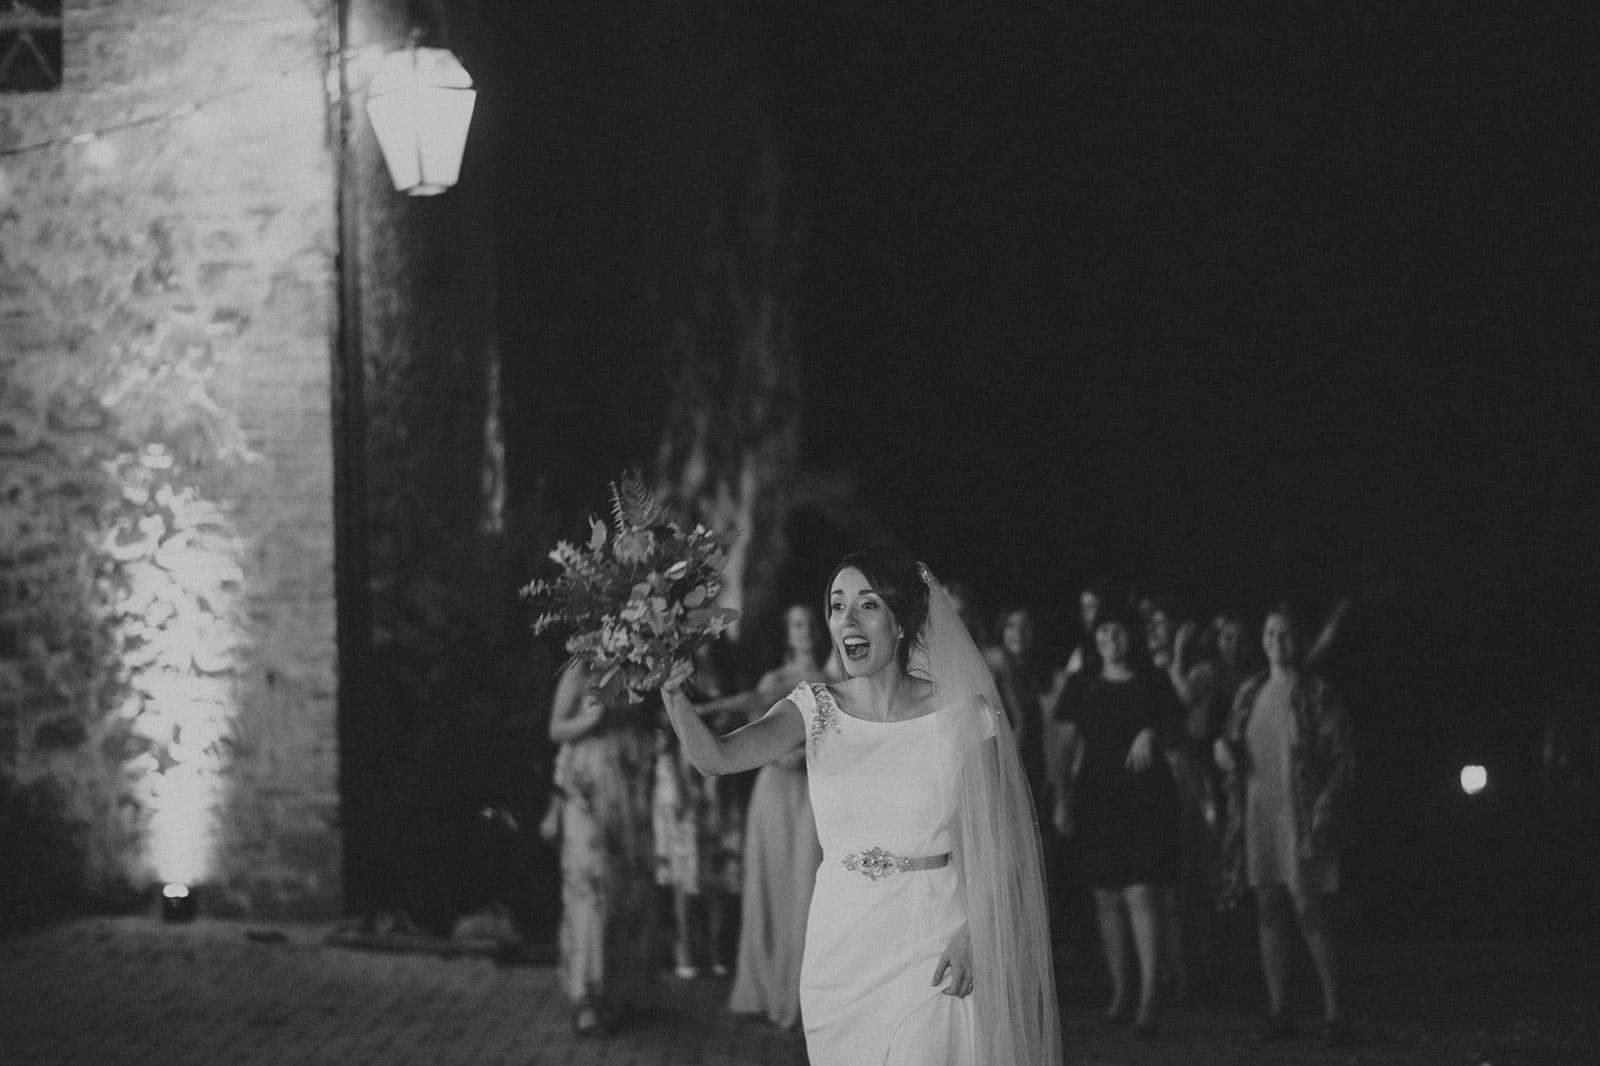 103-wedding-tuscany-san-galgano-federico-pannacci-photographer